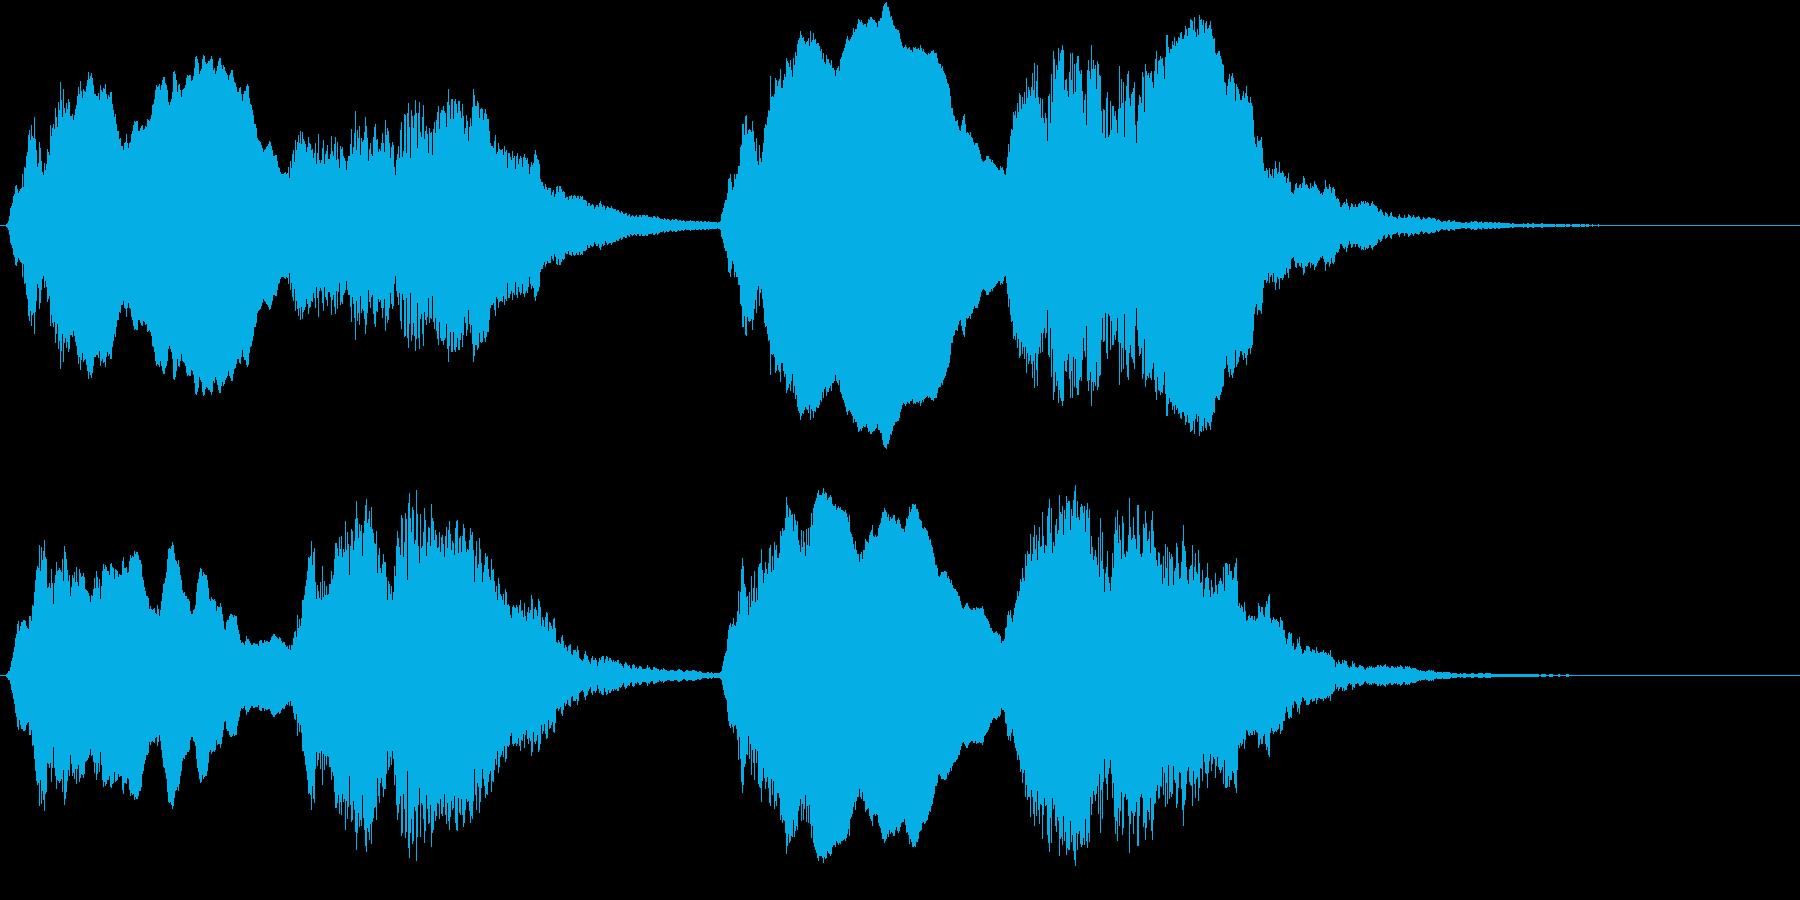 J・S・バッハ作「トッカータとフーガ …の再生済みの波形